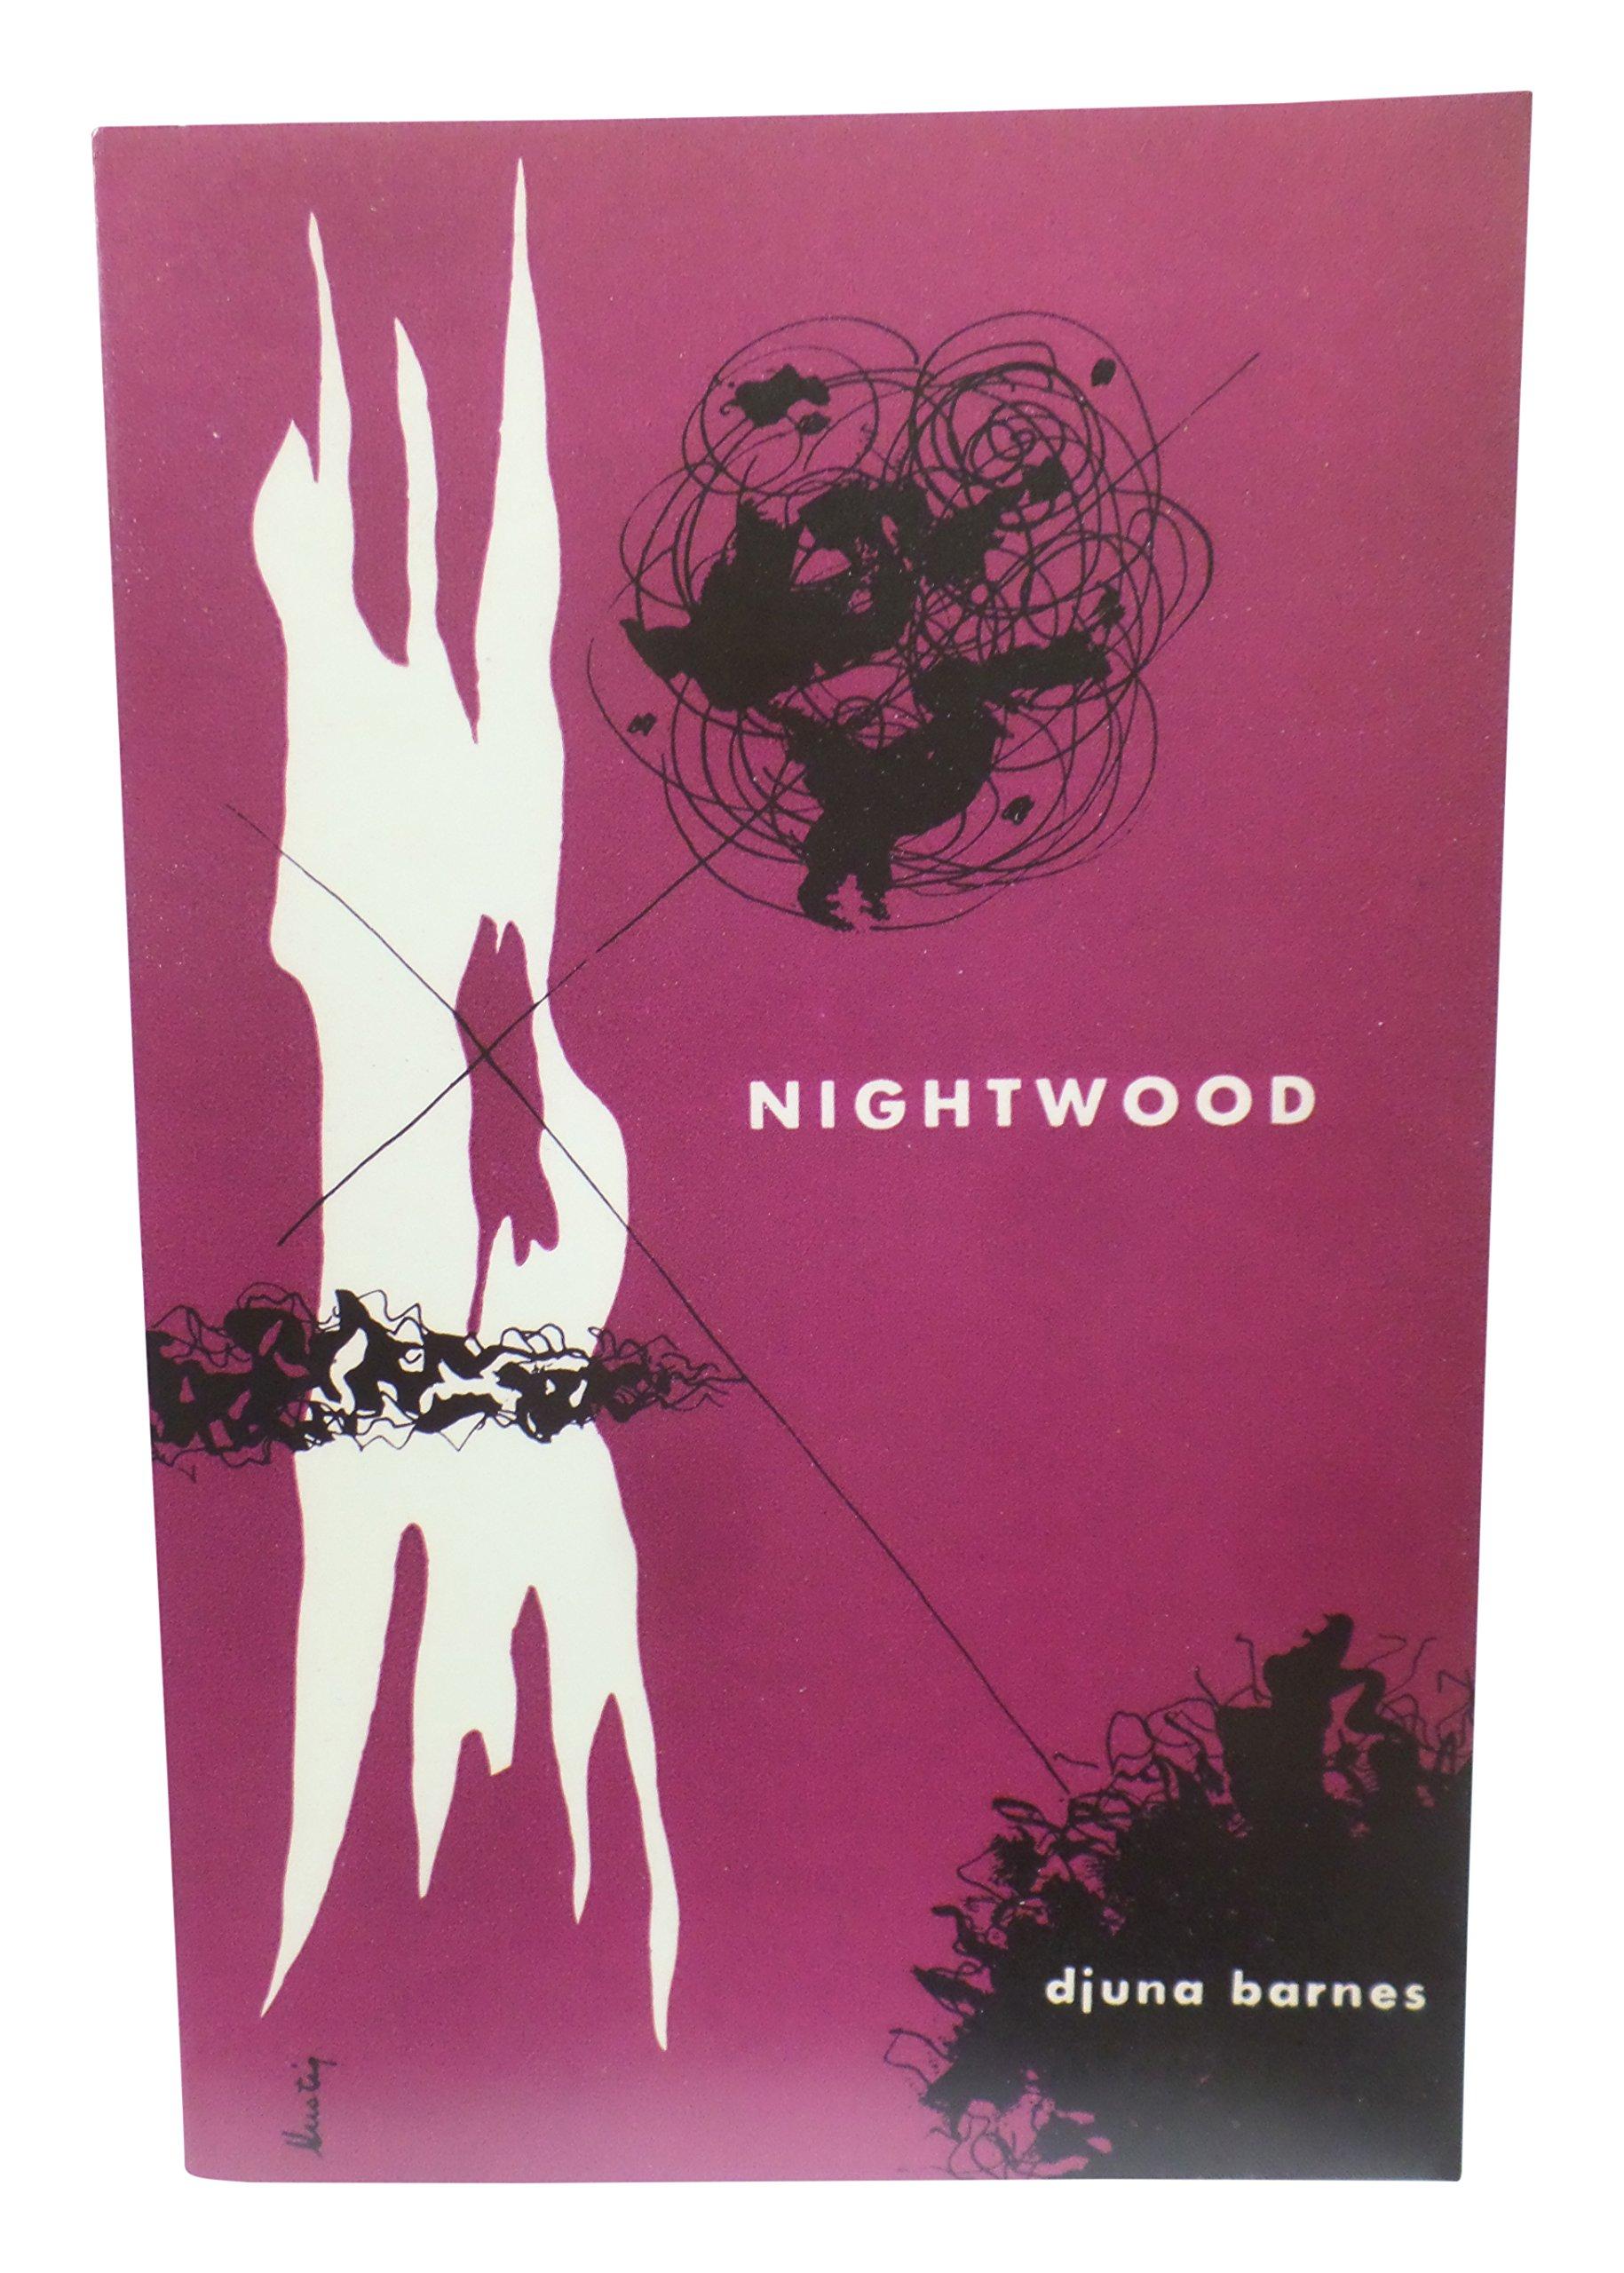 Nightwood (New Edition): Djuna Barnes, Jeanette Winterson, T. S. ...